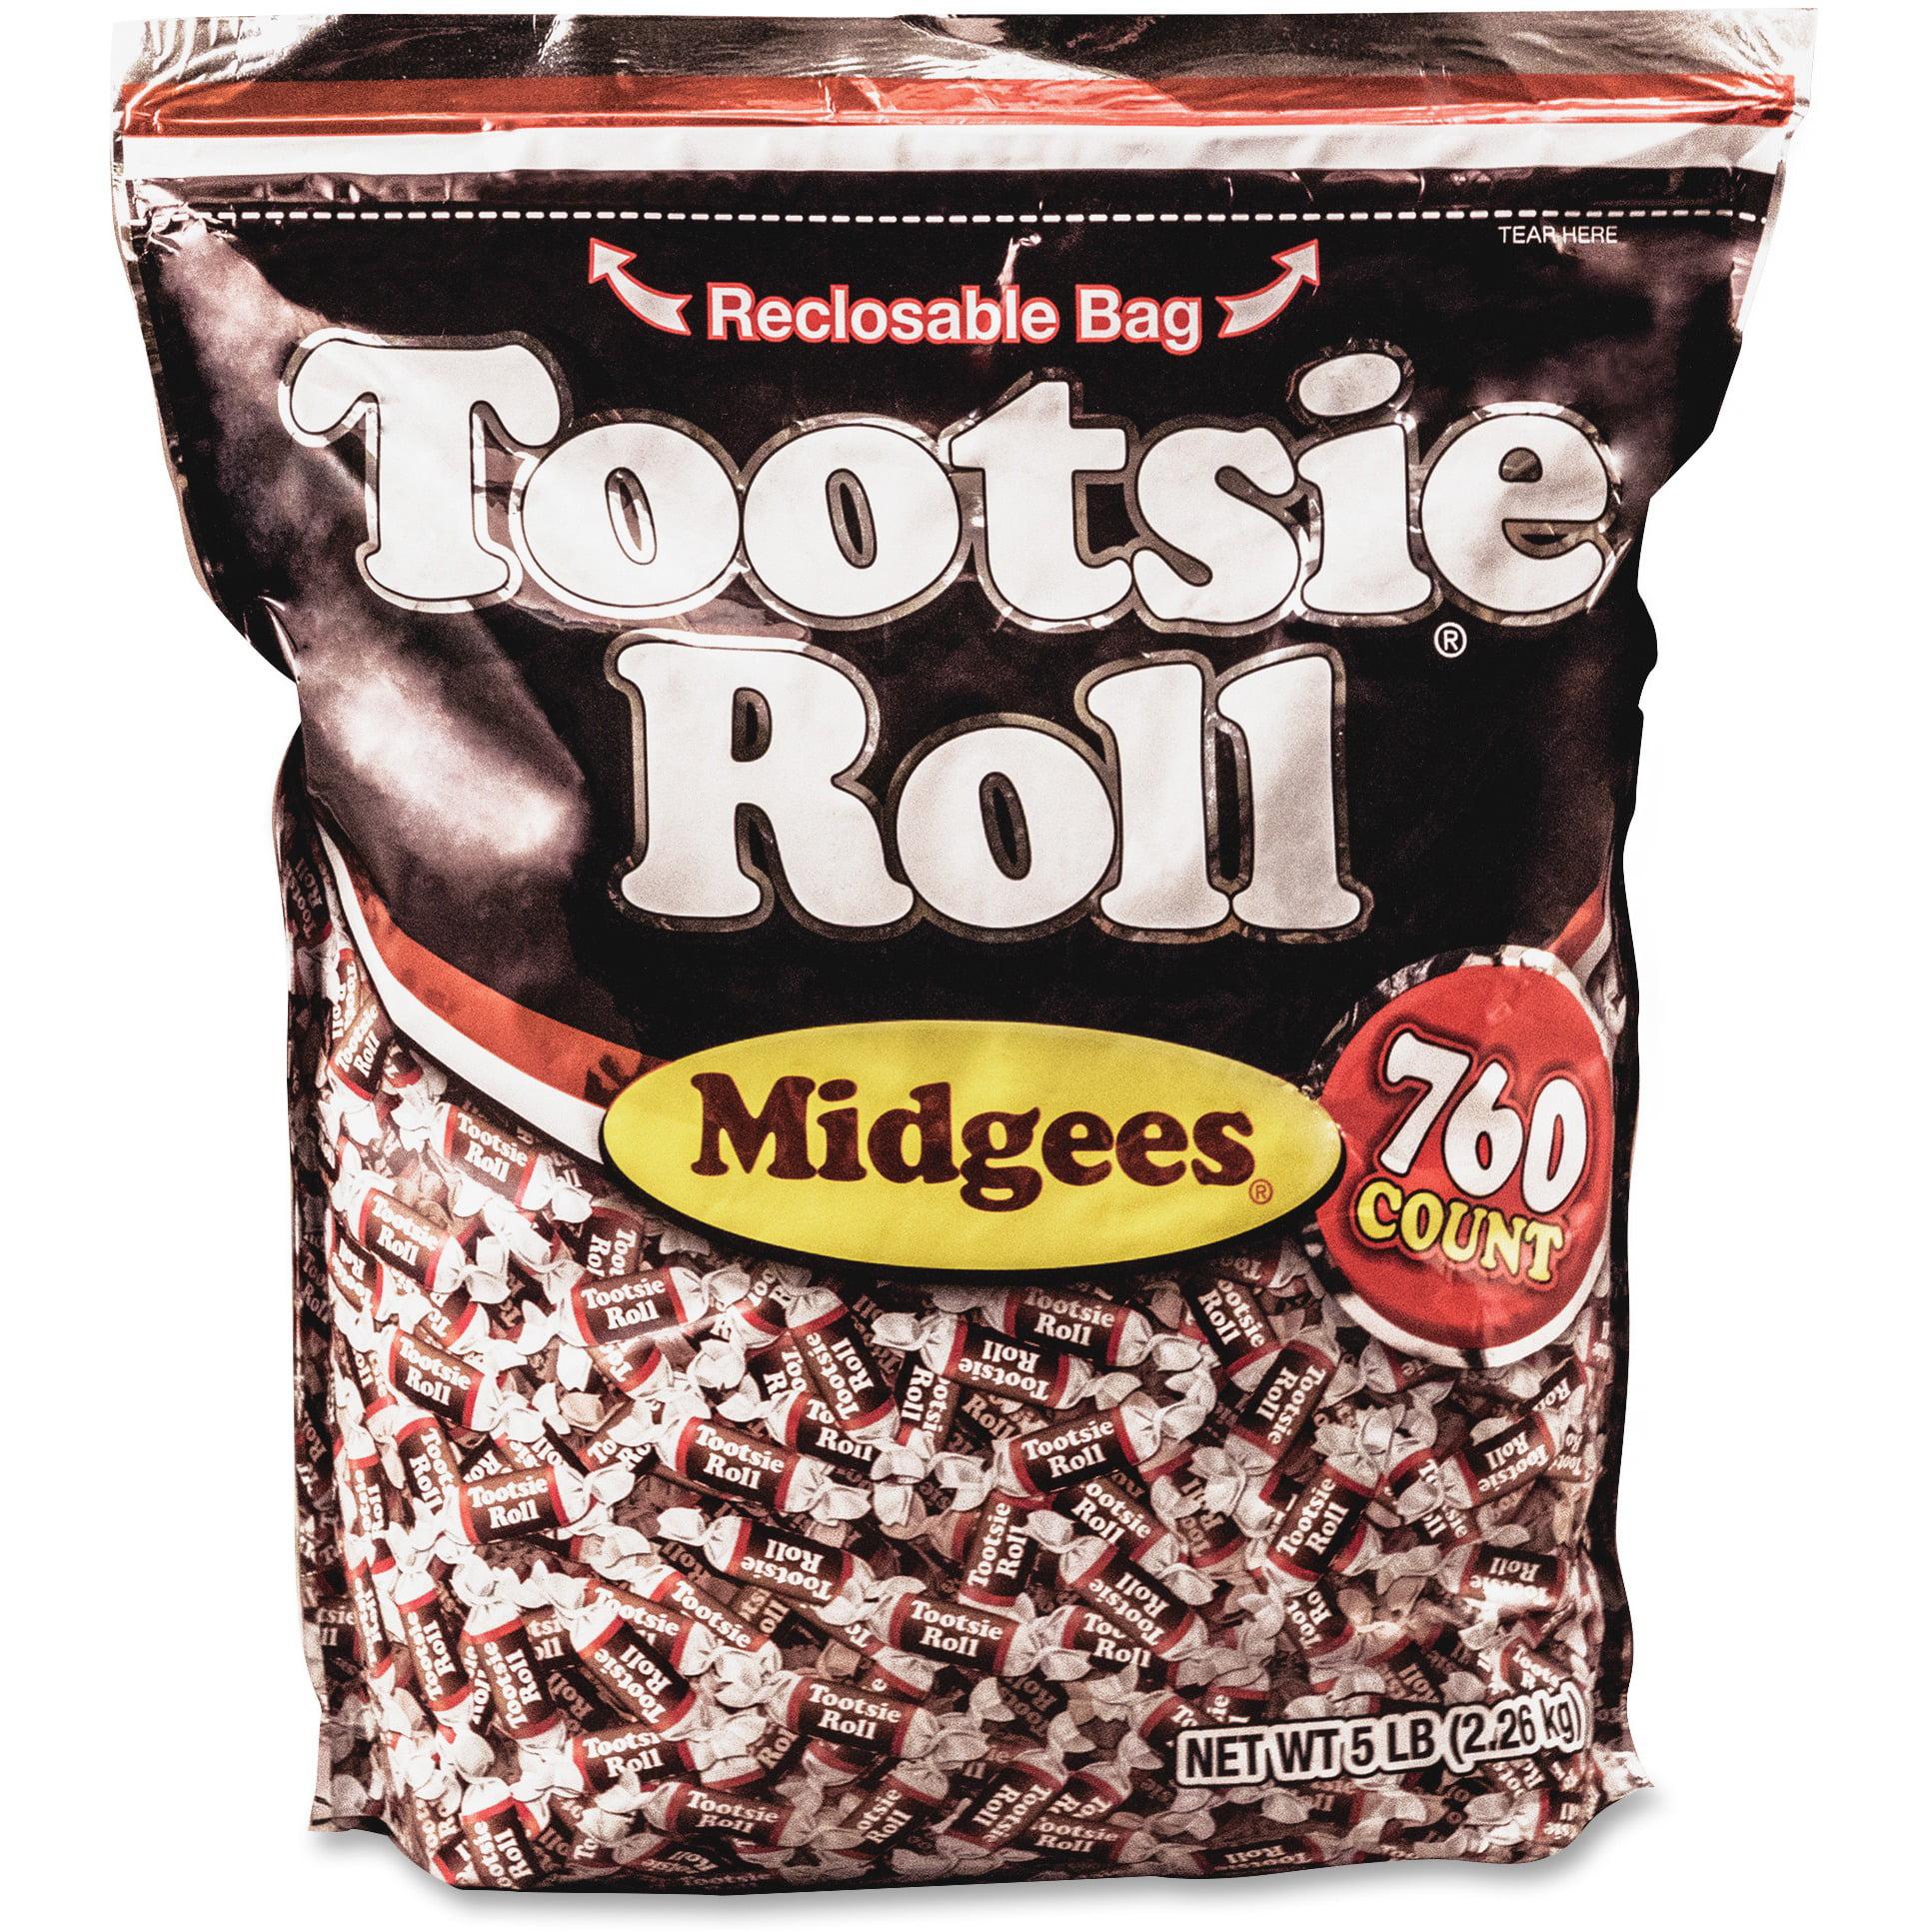 Tootsie, AVTSN884580, Advantus Roll Midgees Candy, 1 Bag